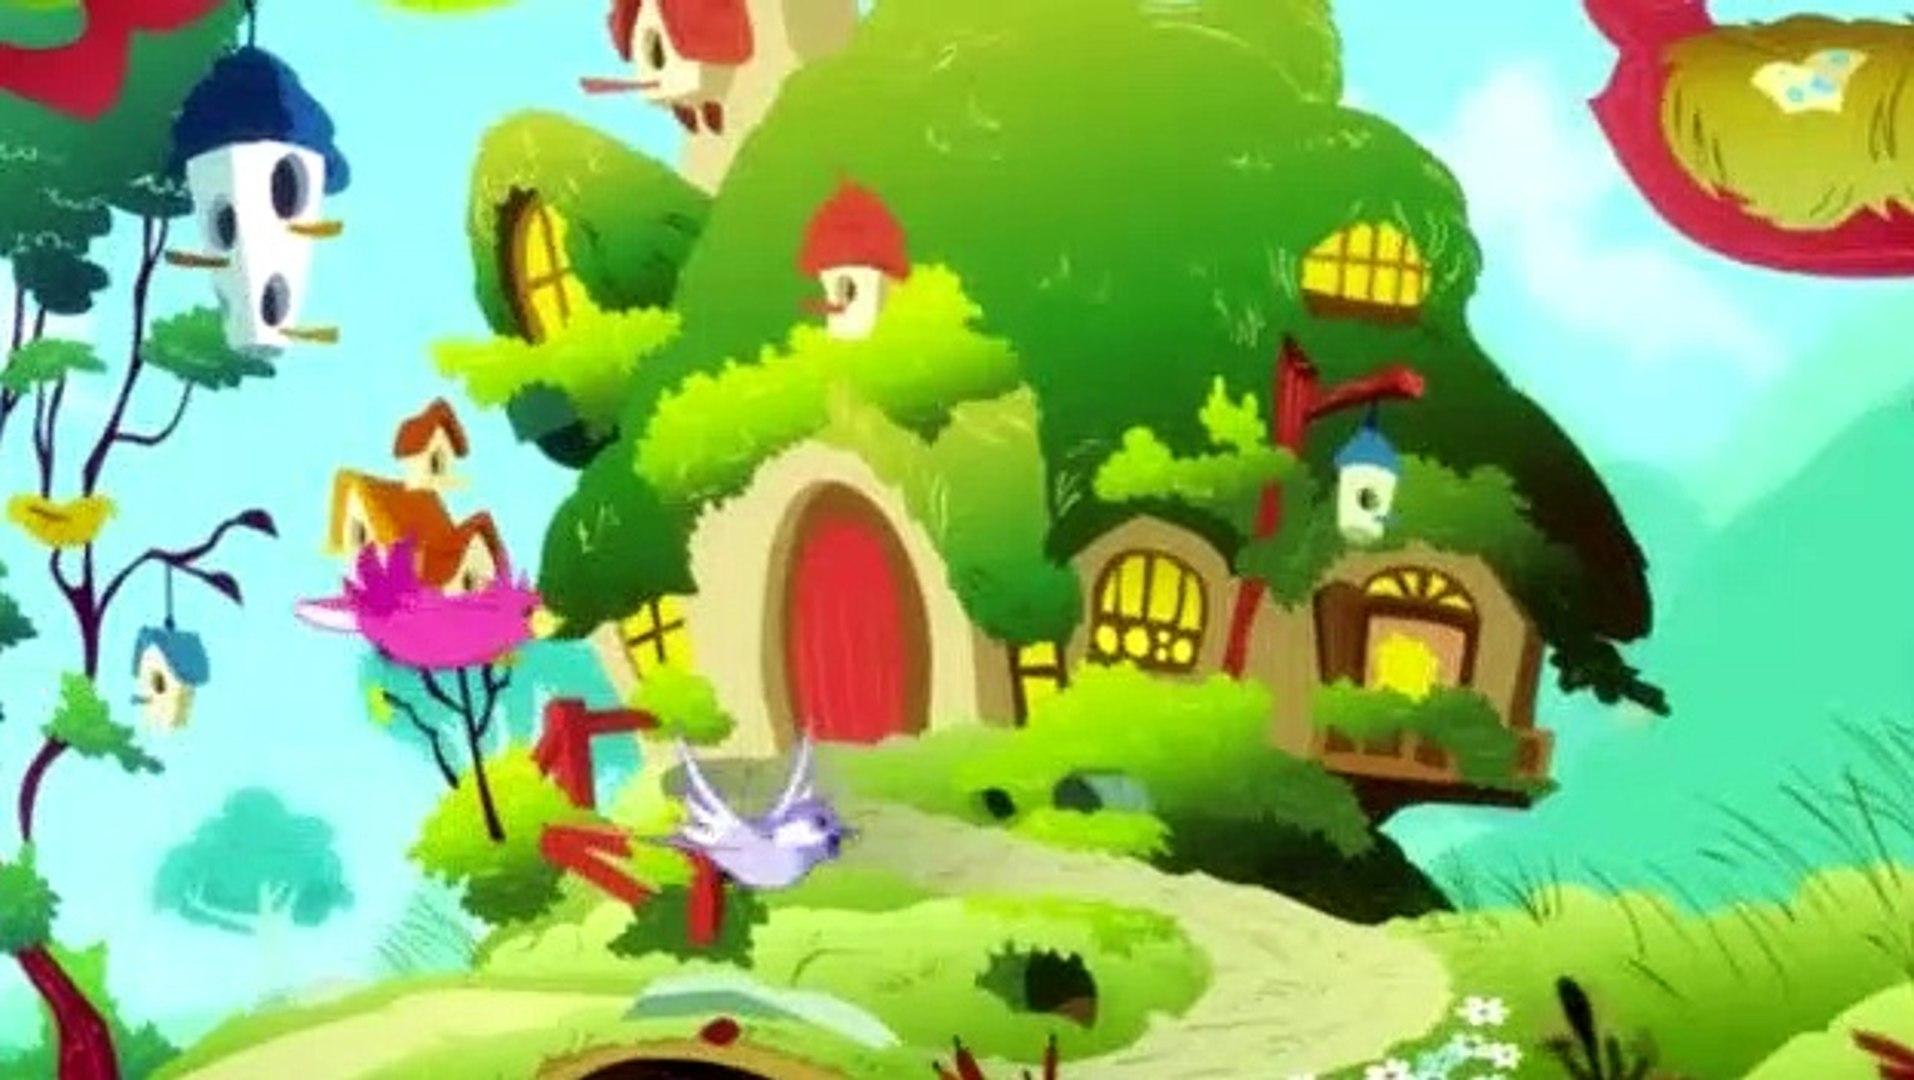 My Little Pony Friendship is Magic S05E07 - Make New Friends